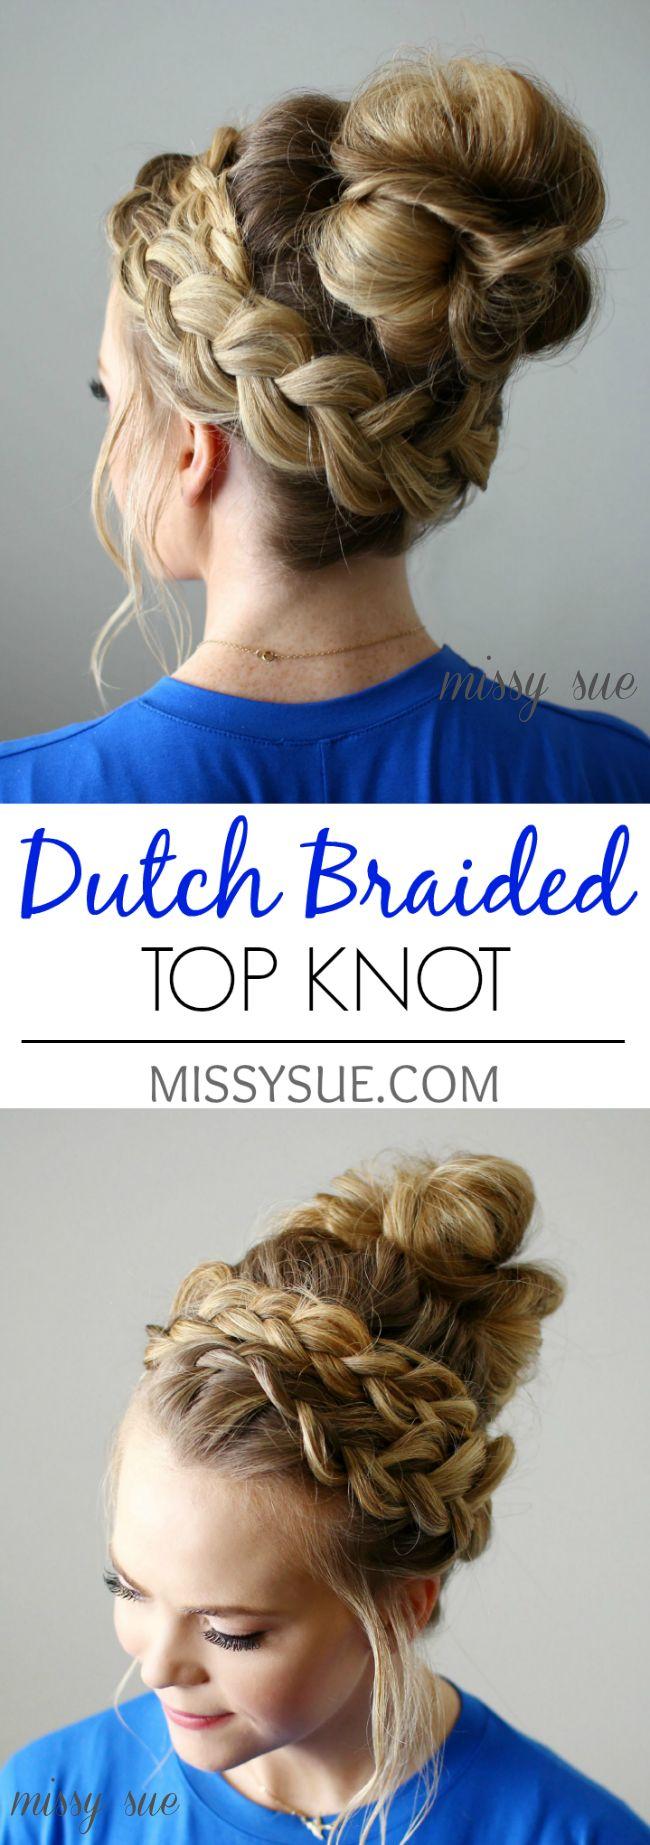 dutch-braided-top-knot-missysueblog